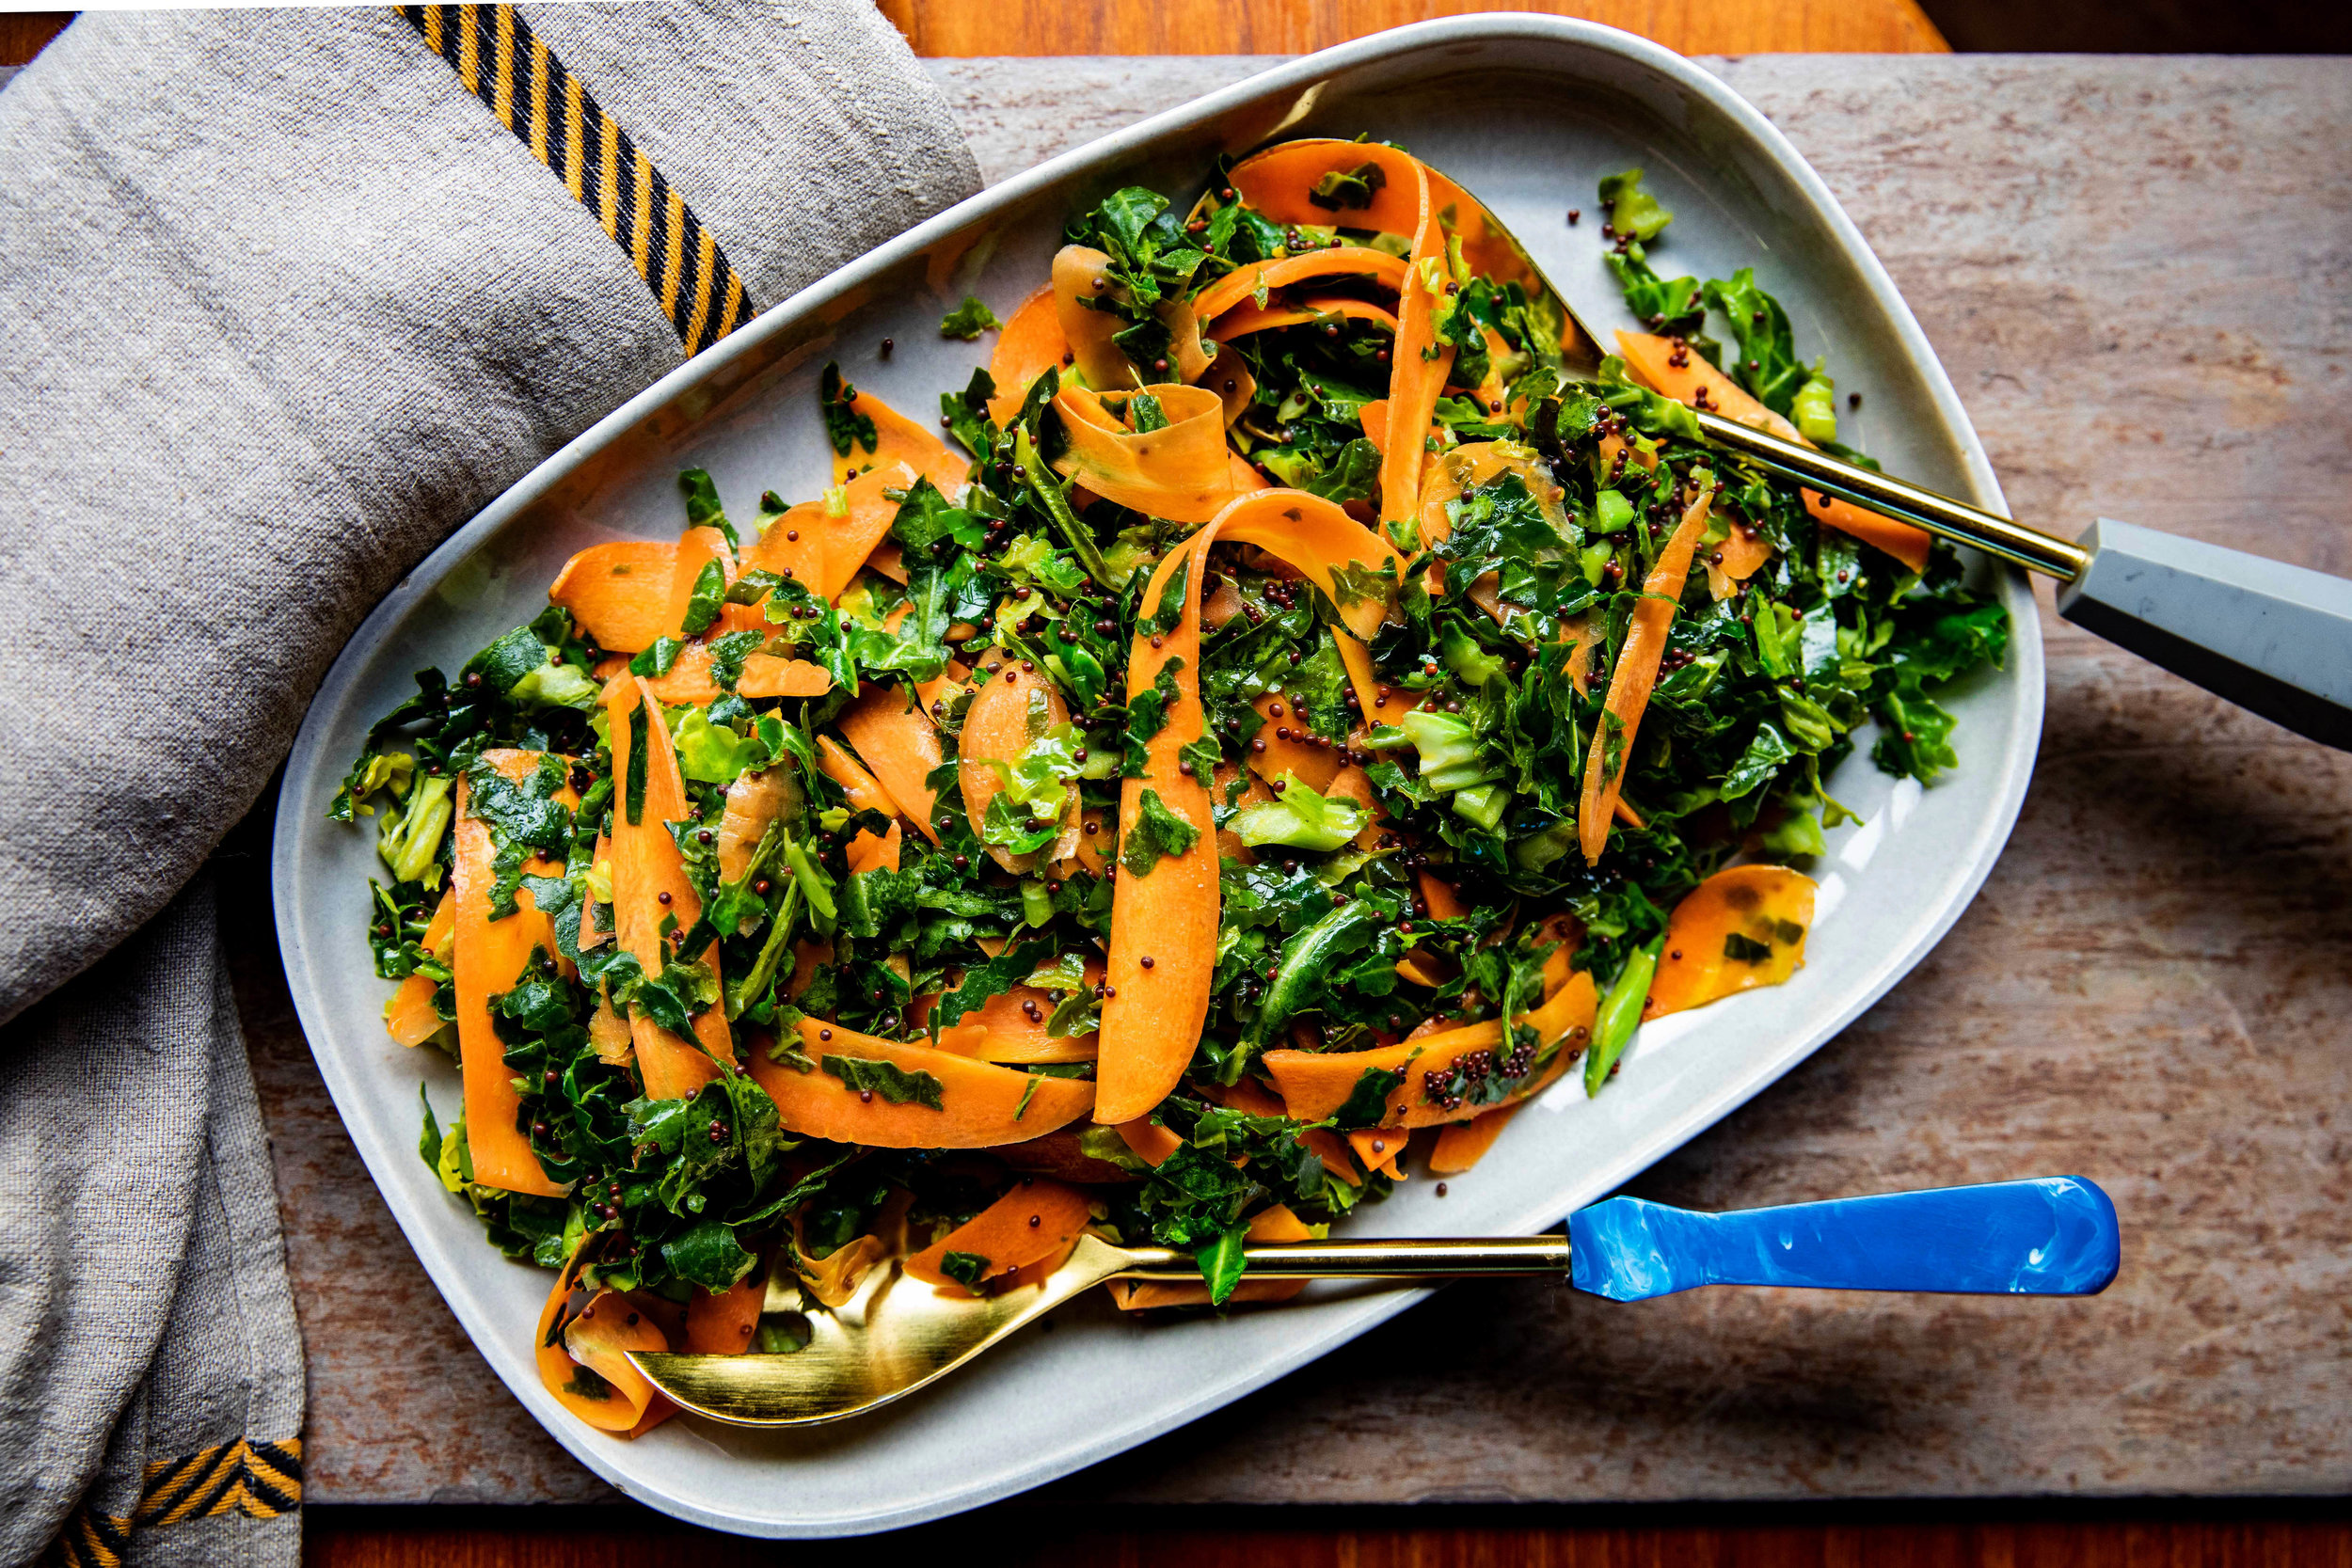 CarrotsandGreens_NickHopperPhotography_-9045.jpg